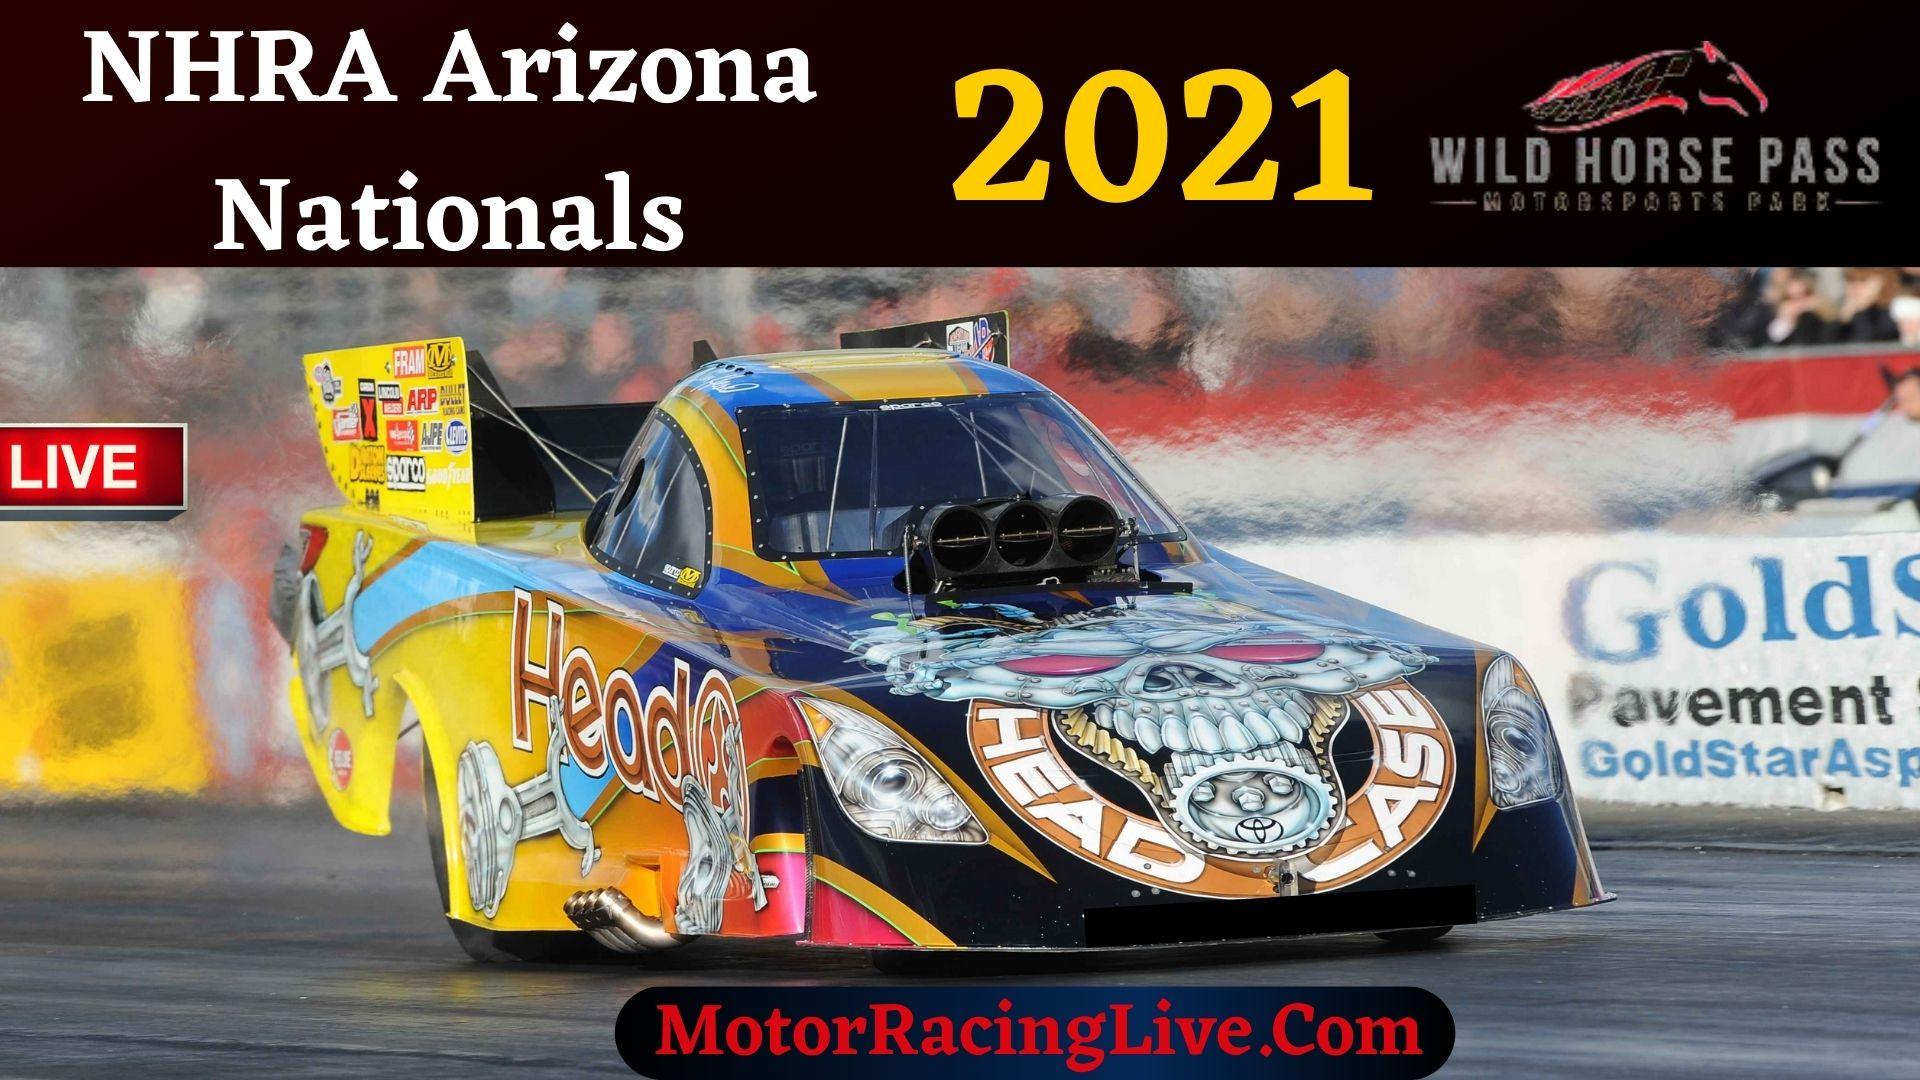 NHRA Arizona Nationals 2021 Live Stream